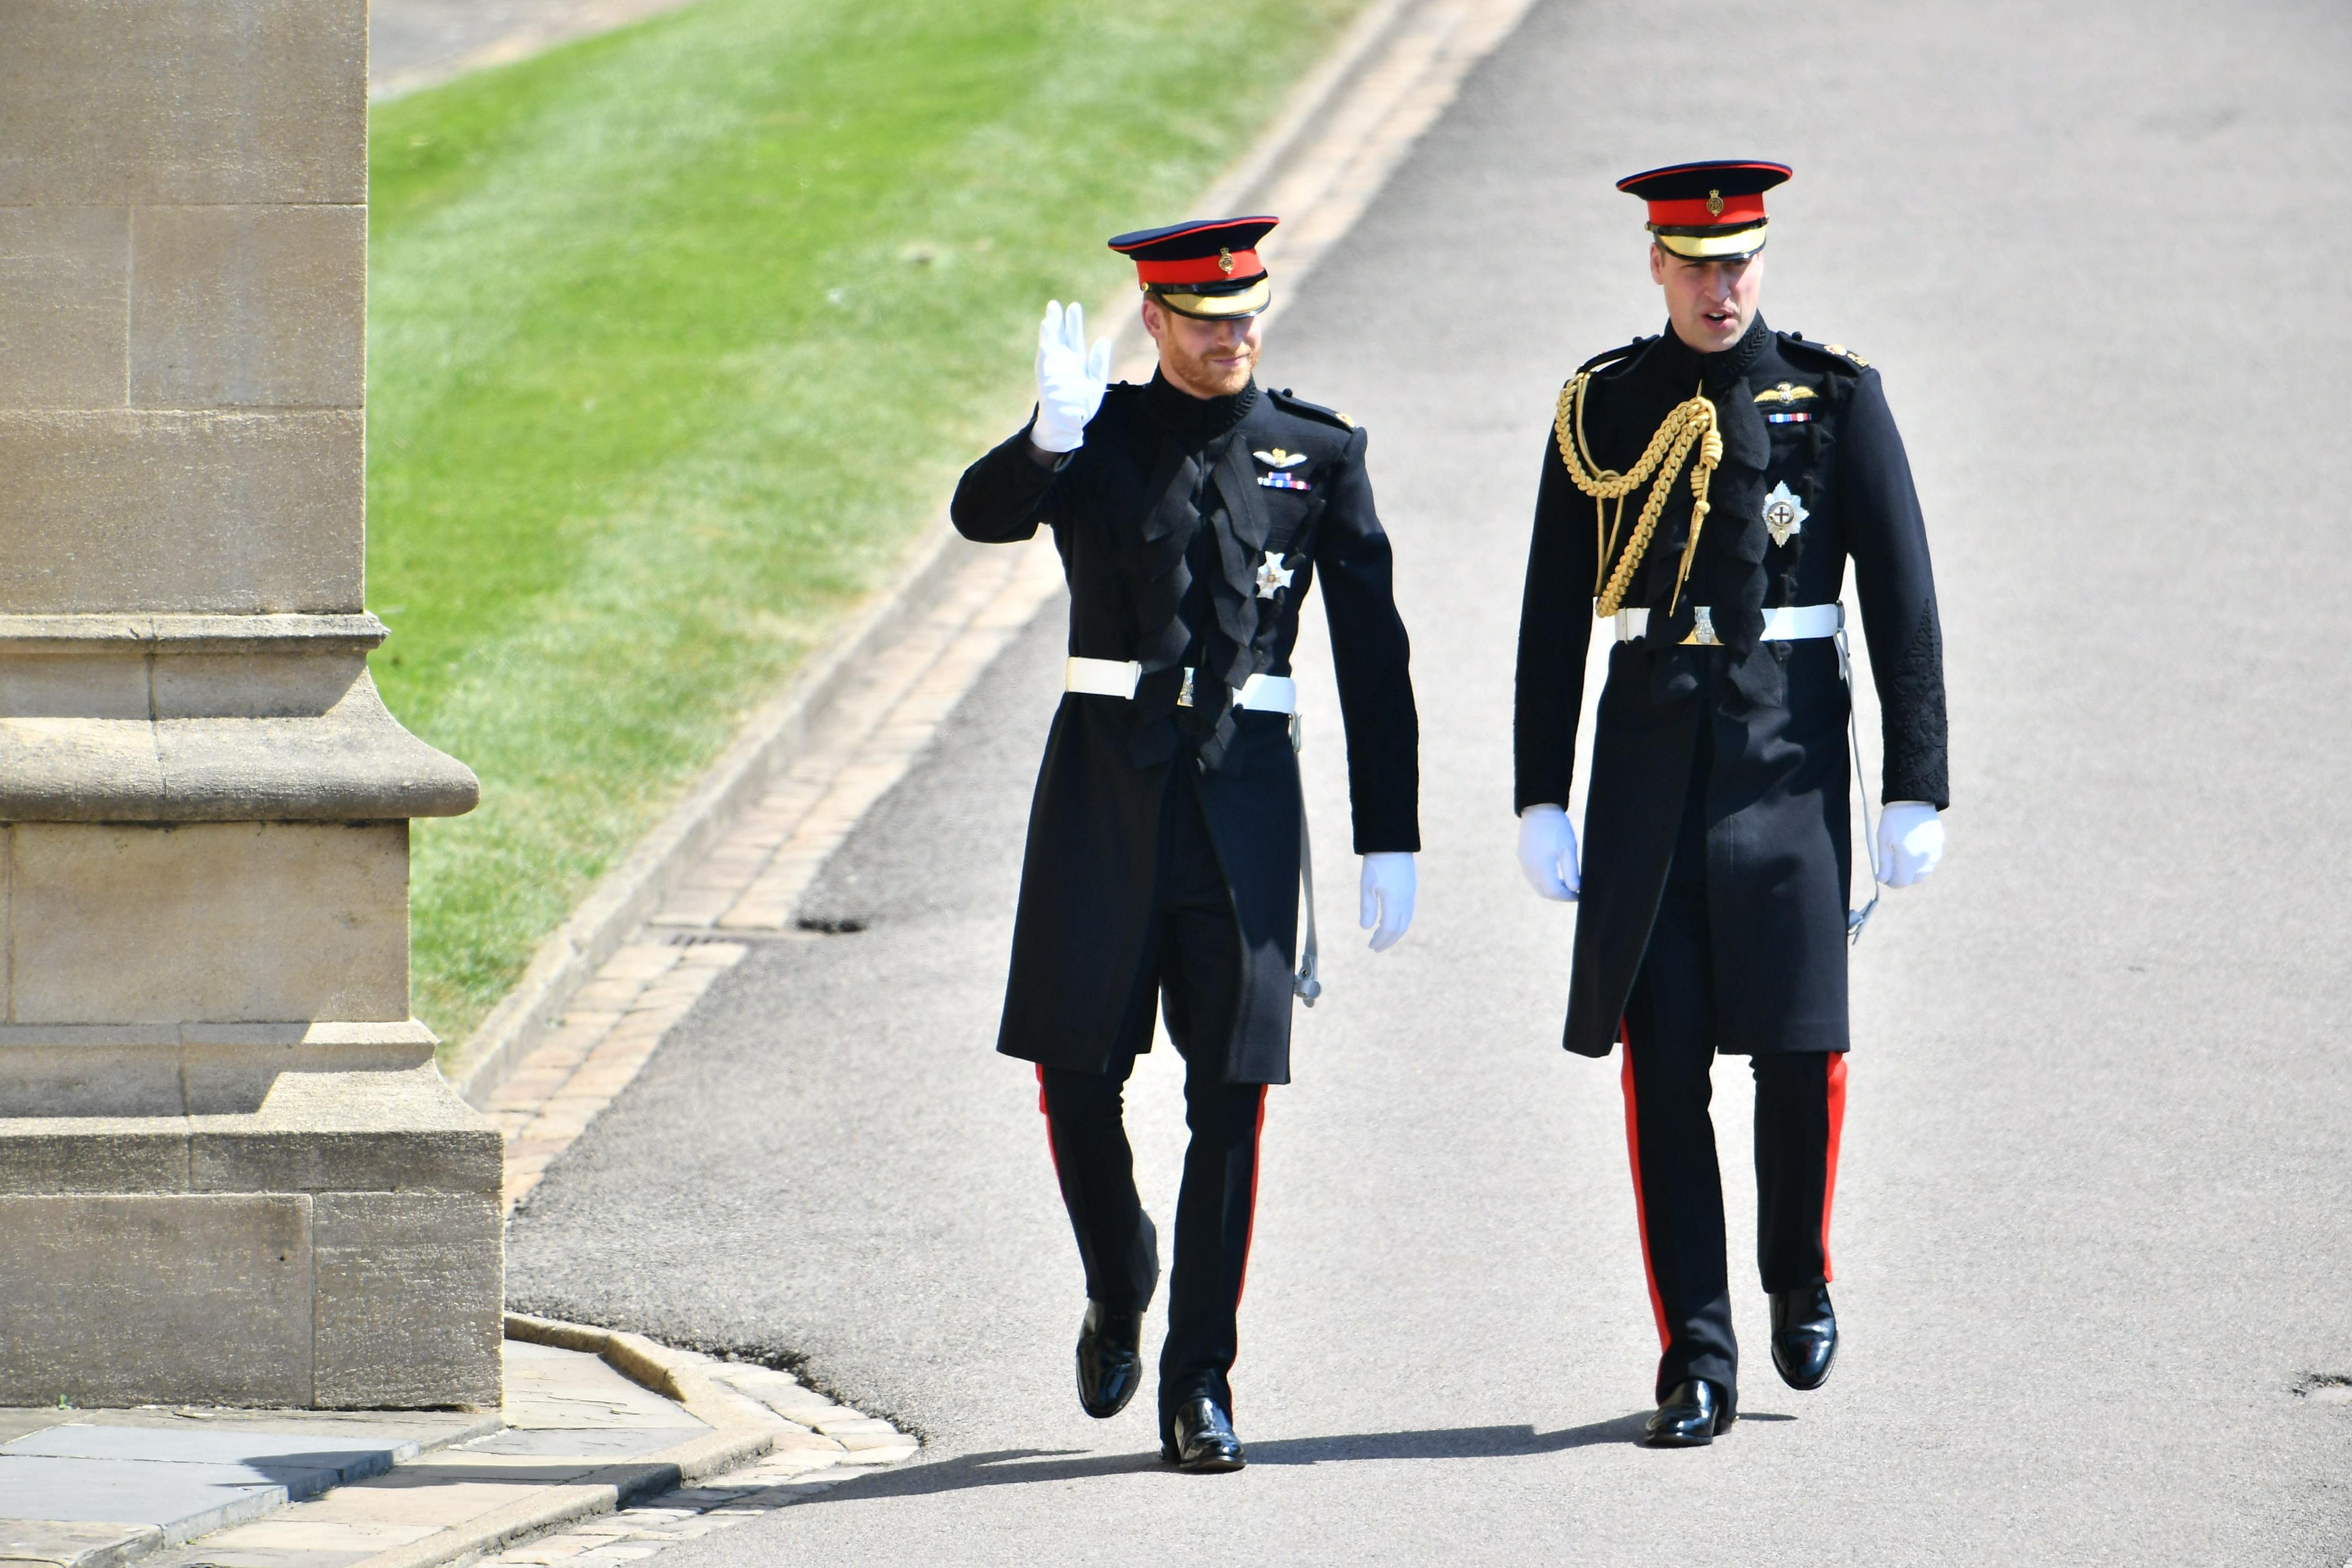 Príncipe Harry, Príncipe William